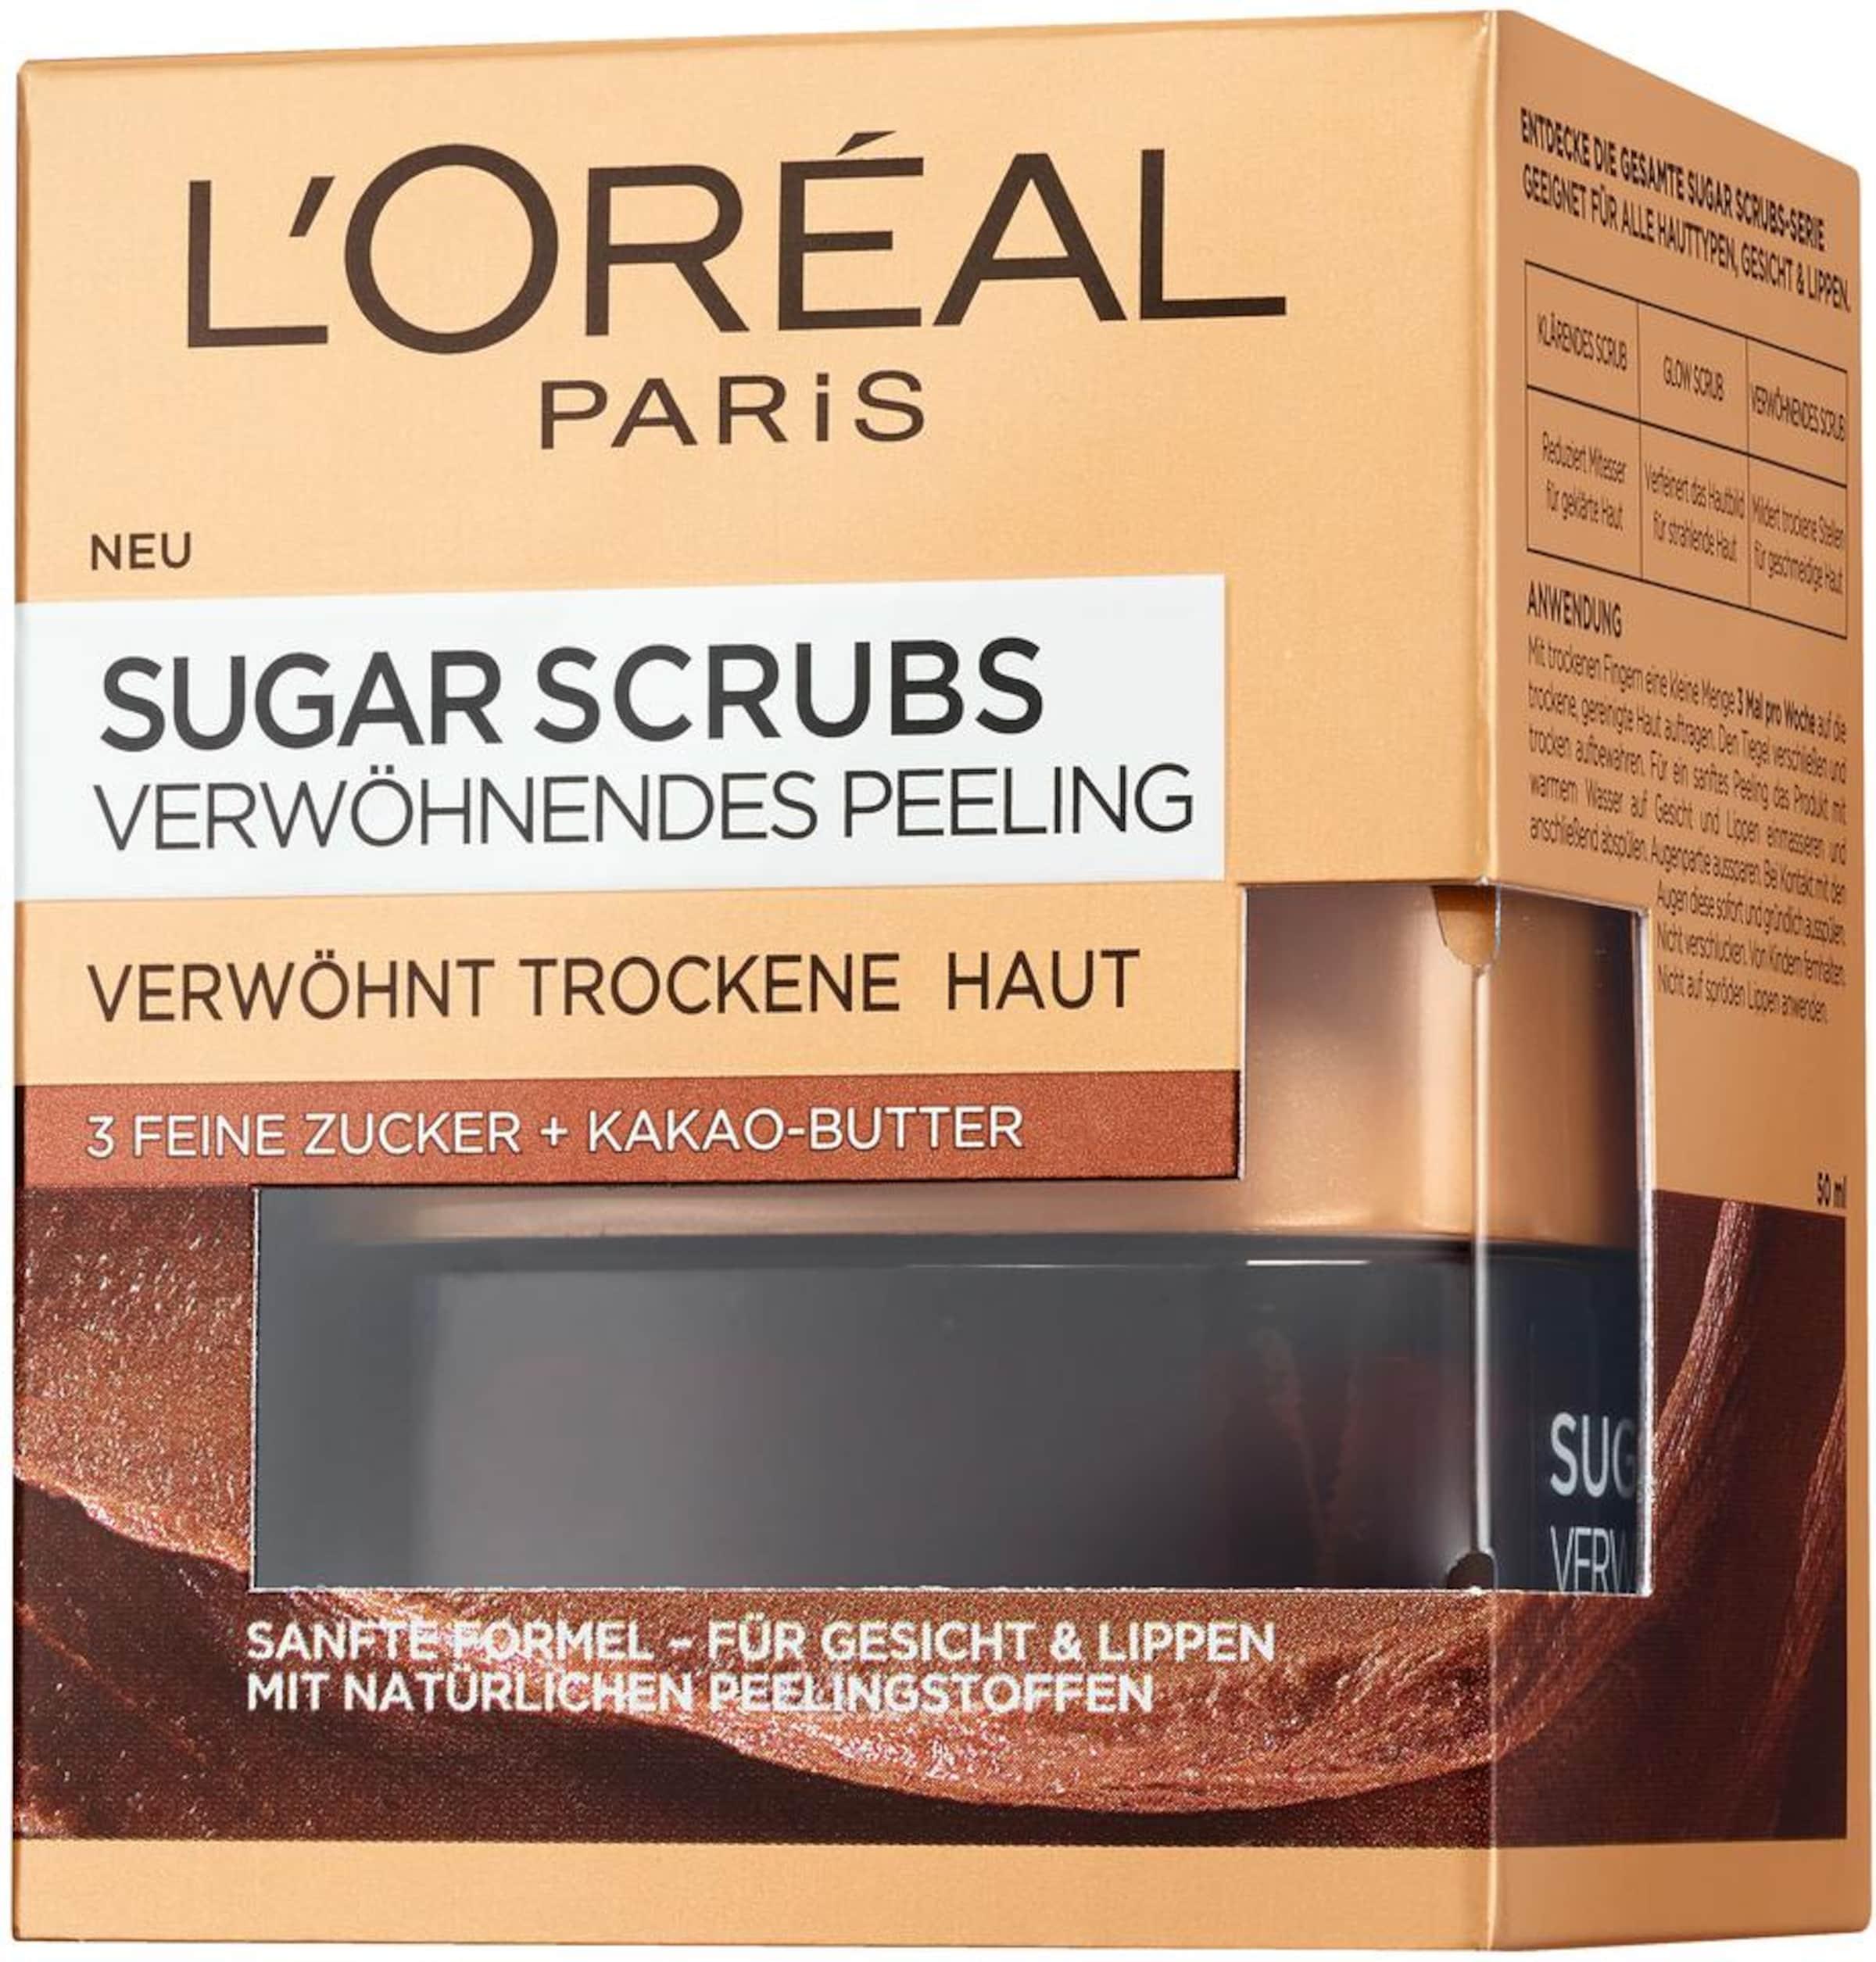 L'oréal Paris In Sugarscrub Nourish Kastanienbraun qVSUzMp